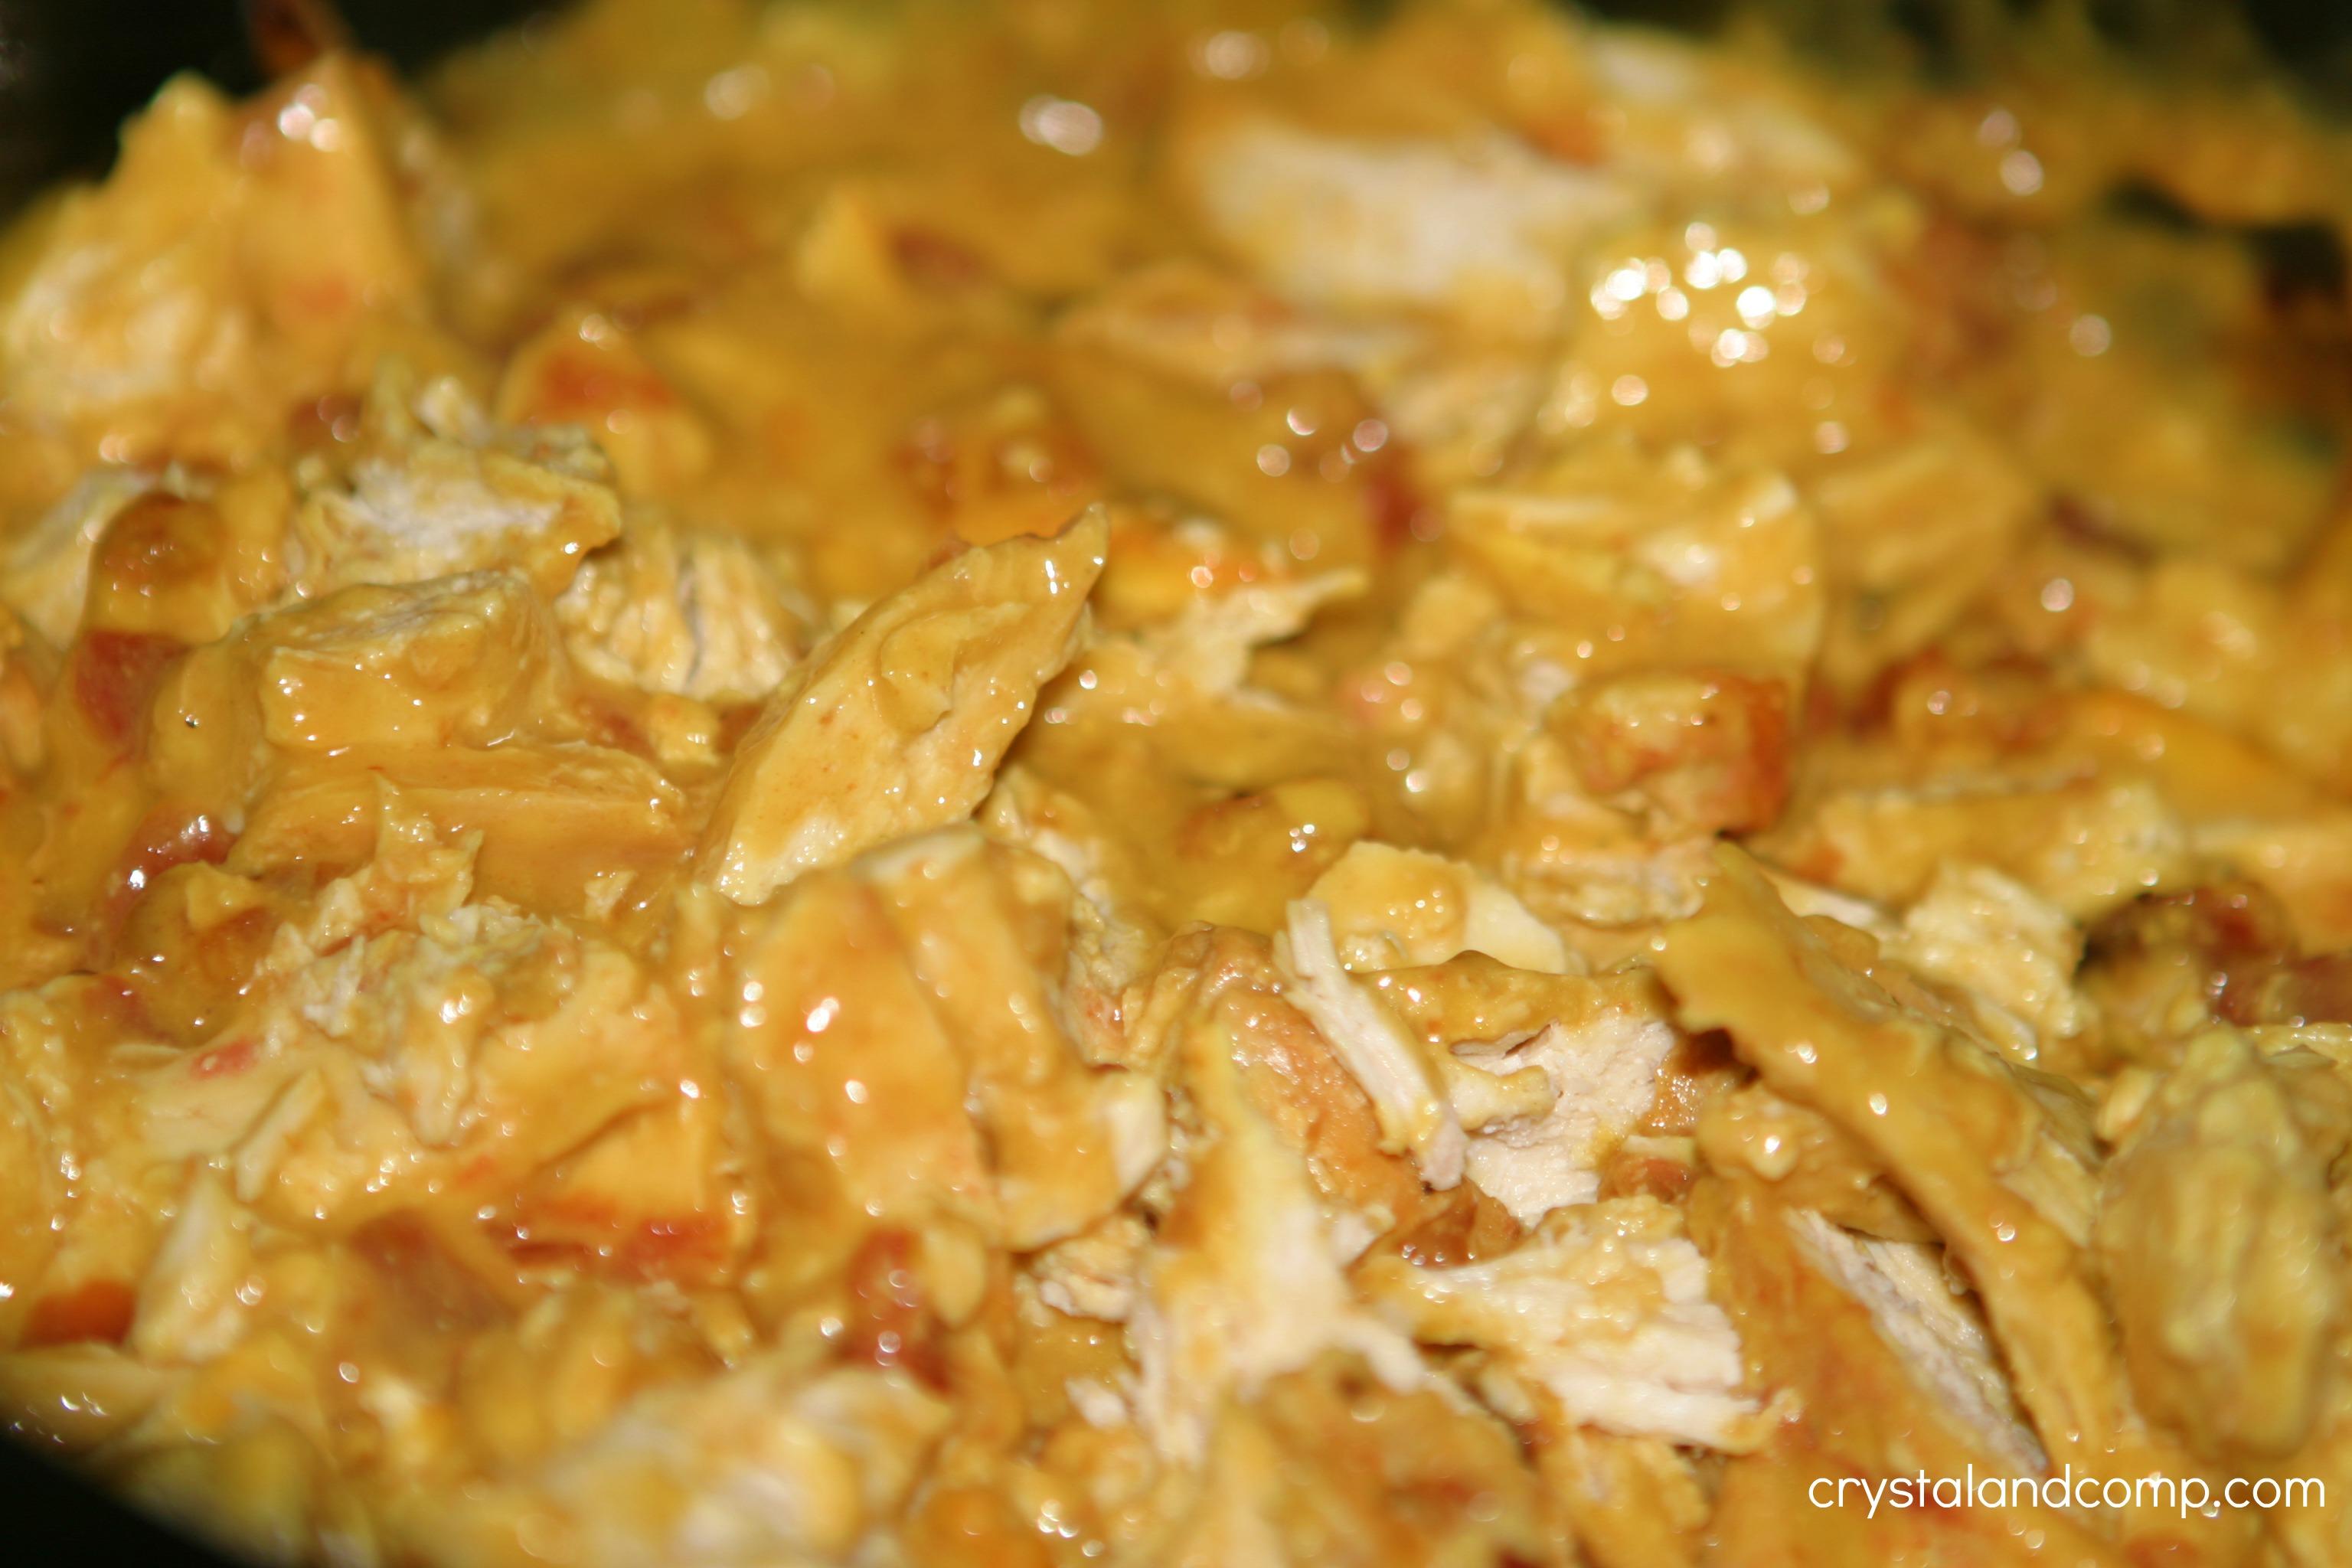 Easy Recipes: Creamy Crockpot Chicken Tacos | CrystalandComp.com